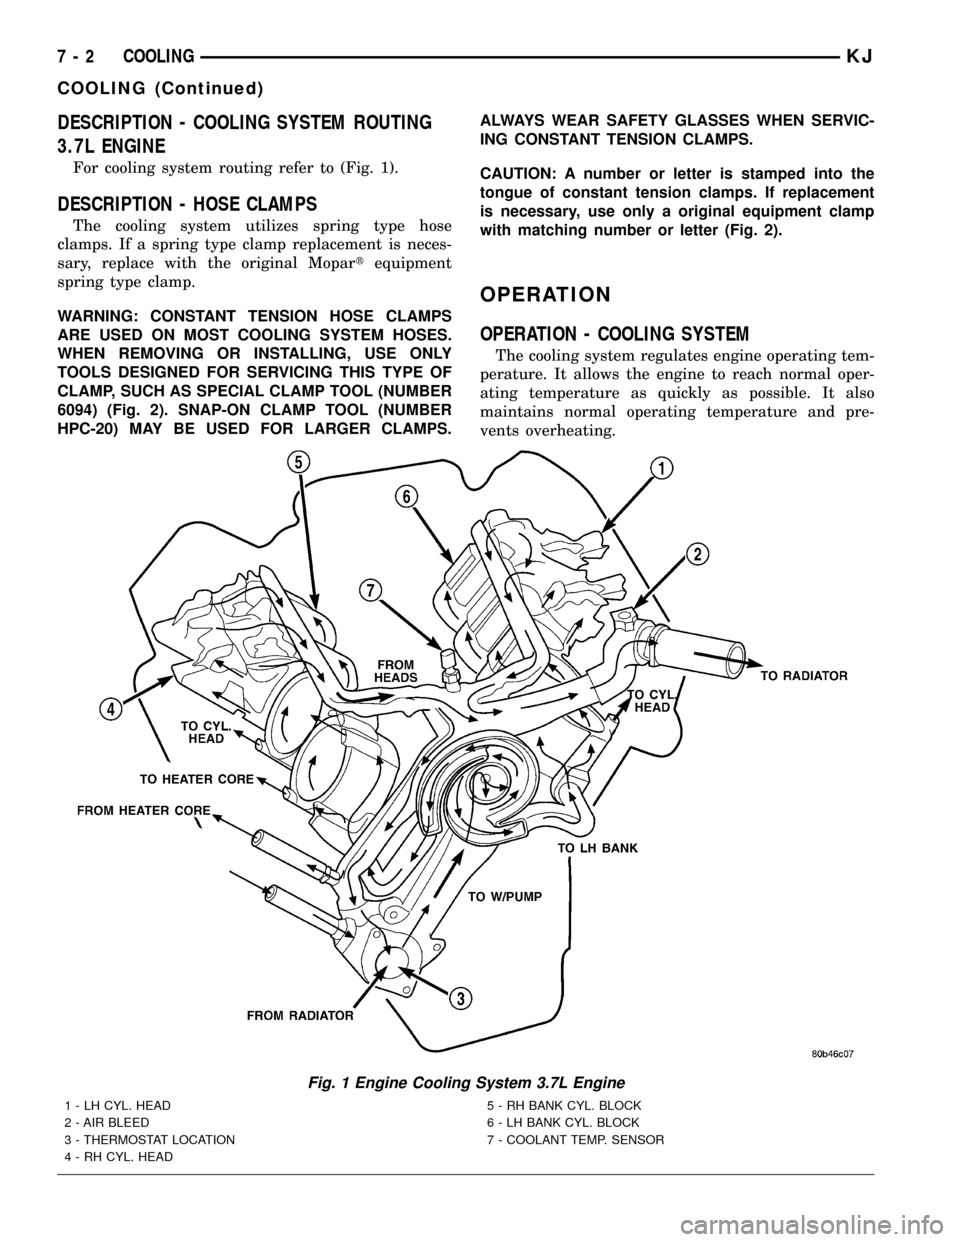 medium resolution of jeep liberty 2002 kj 1 g workshop manual page 217 description engine